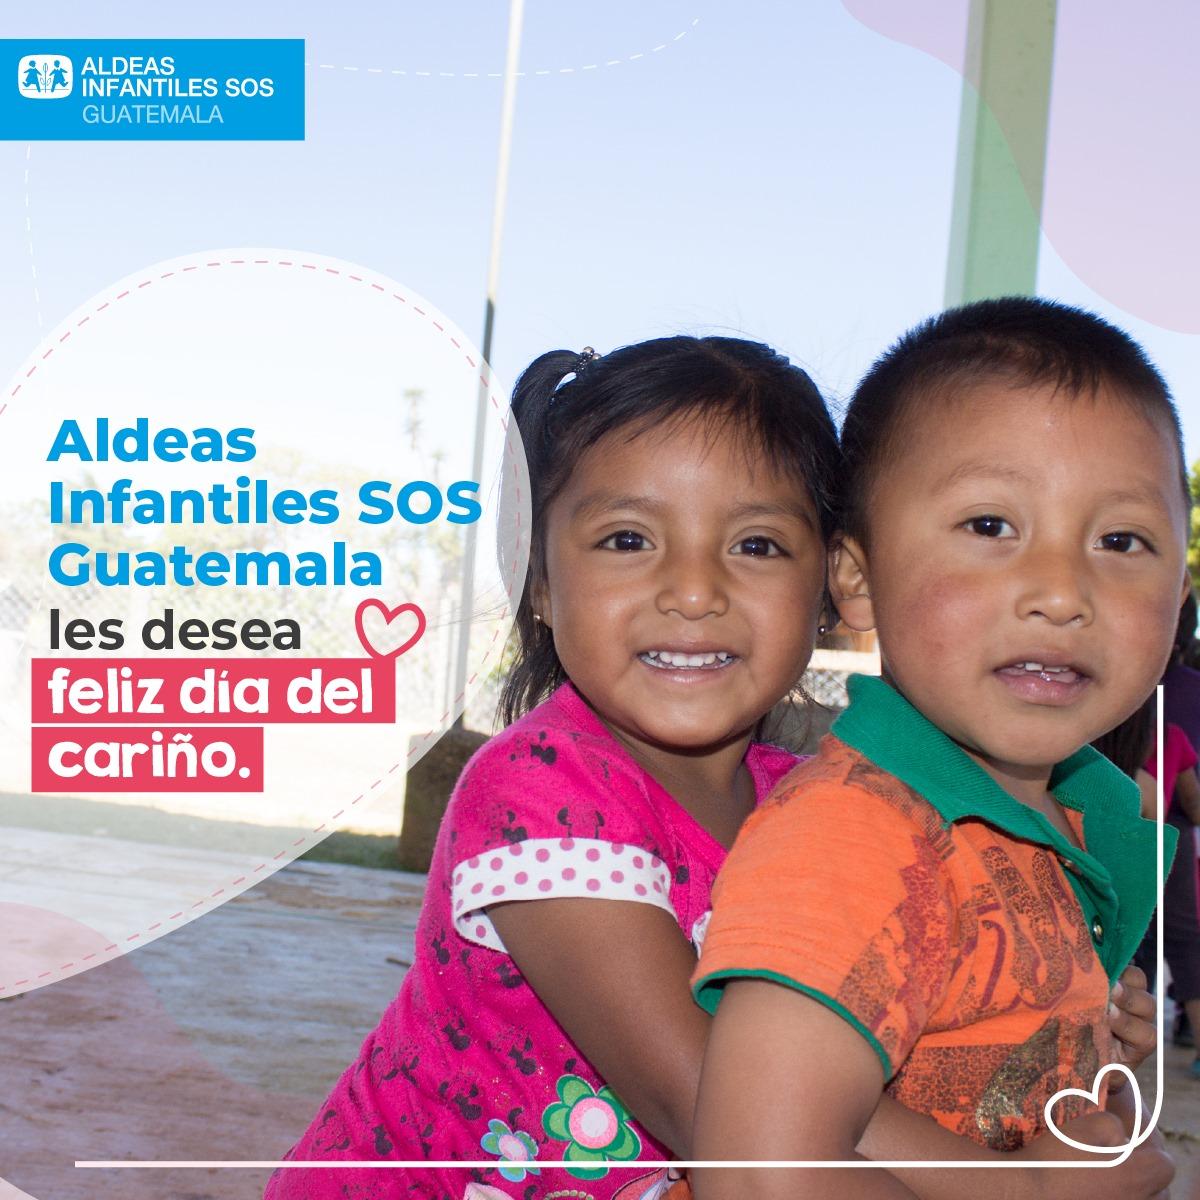 Aldeas Infatiles SOS